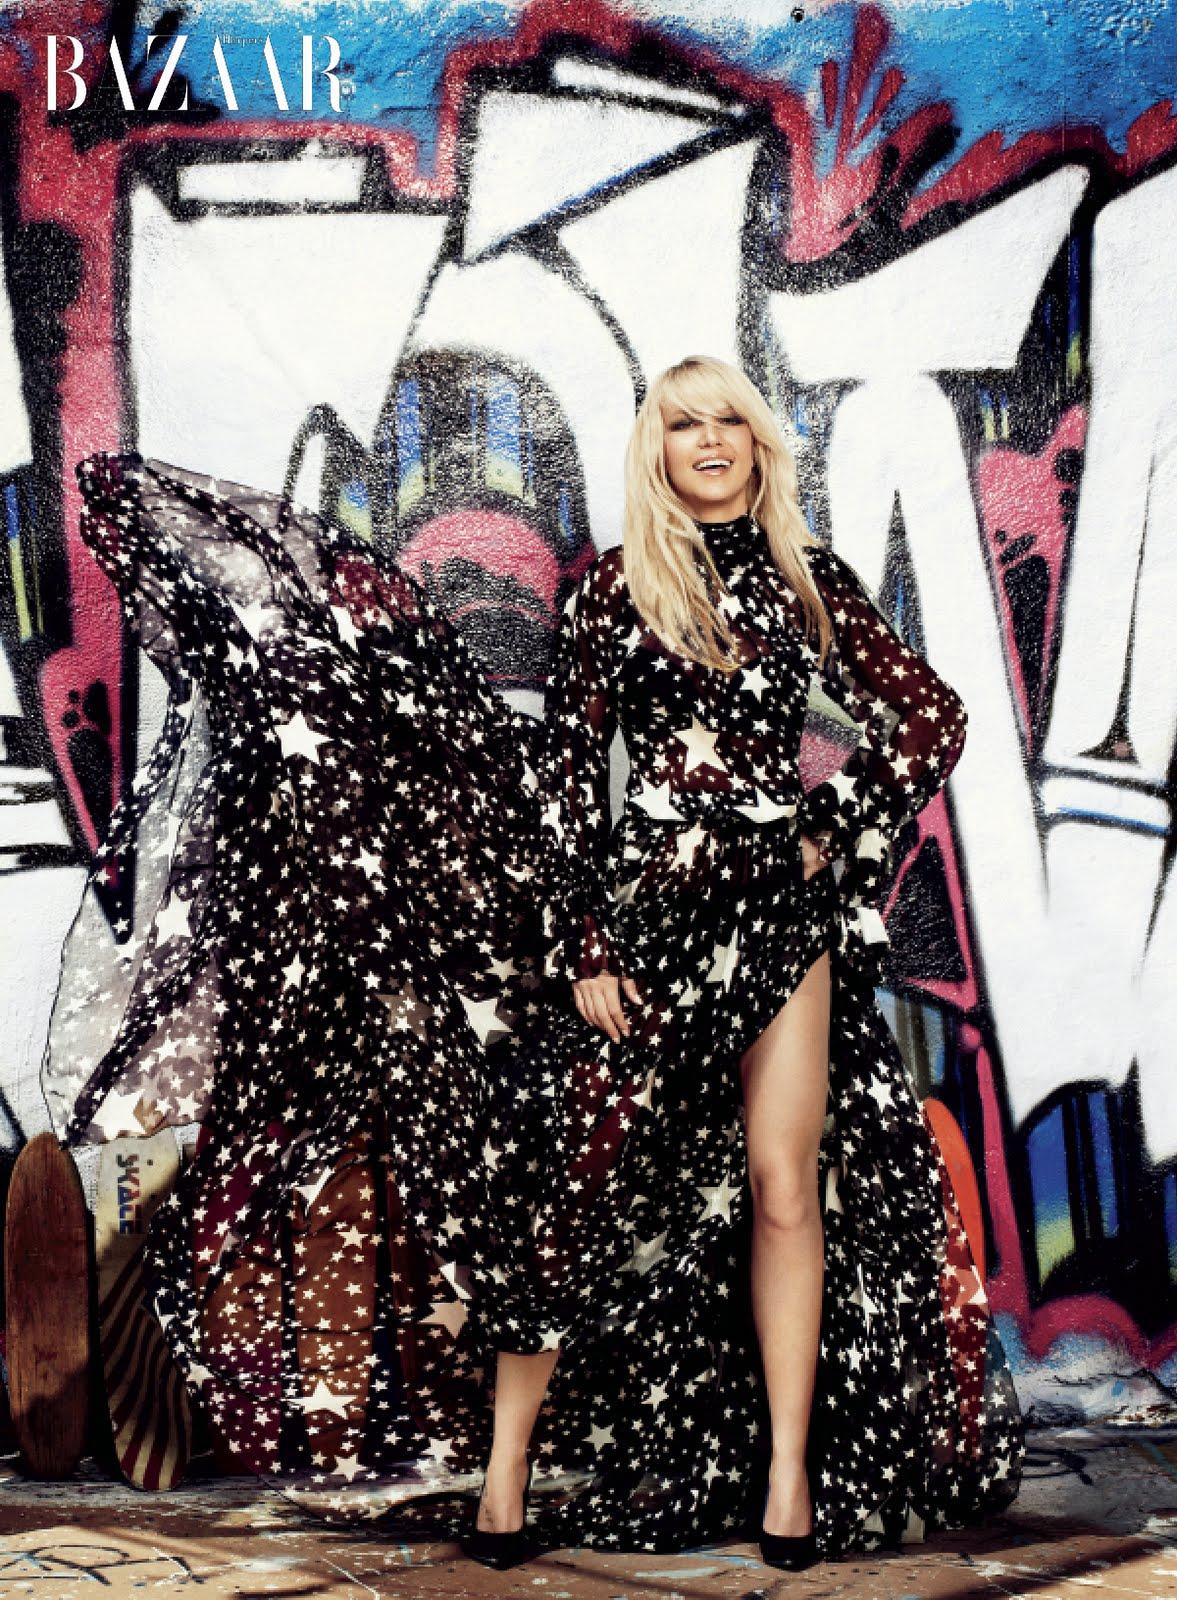 http://1.bp.blogspot.com/-OffZzkzXdvo/TdE0txwnlbI/AAAAAAAAKg8/b-IxyESOBIs/s1600/HBZ+Britney+2+lo.jpg